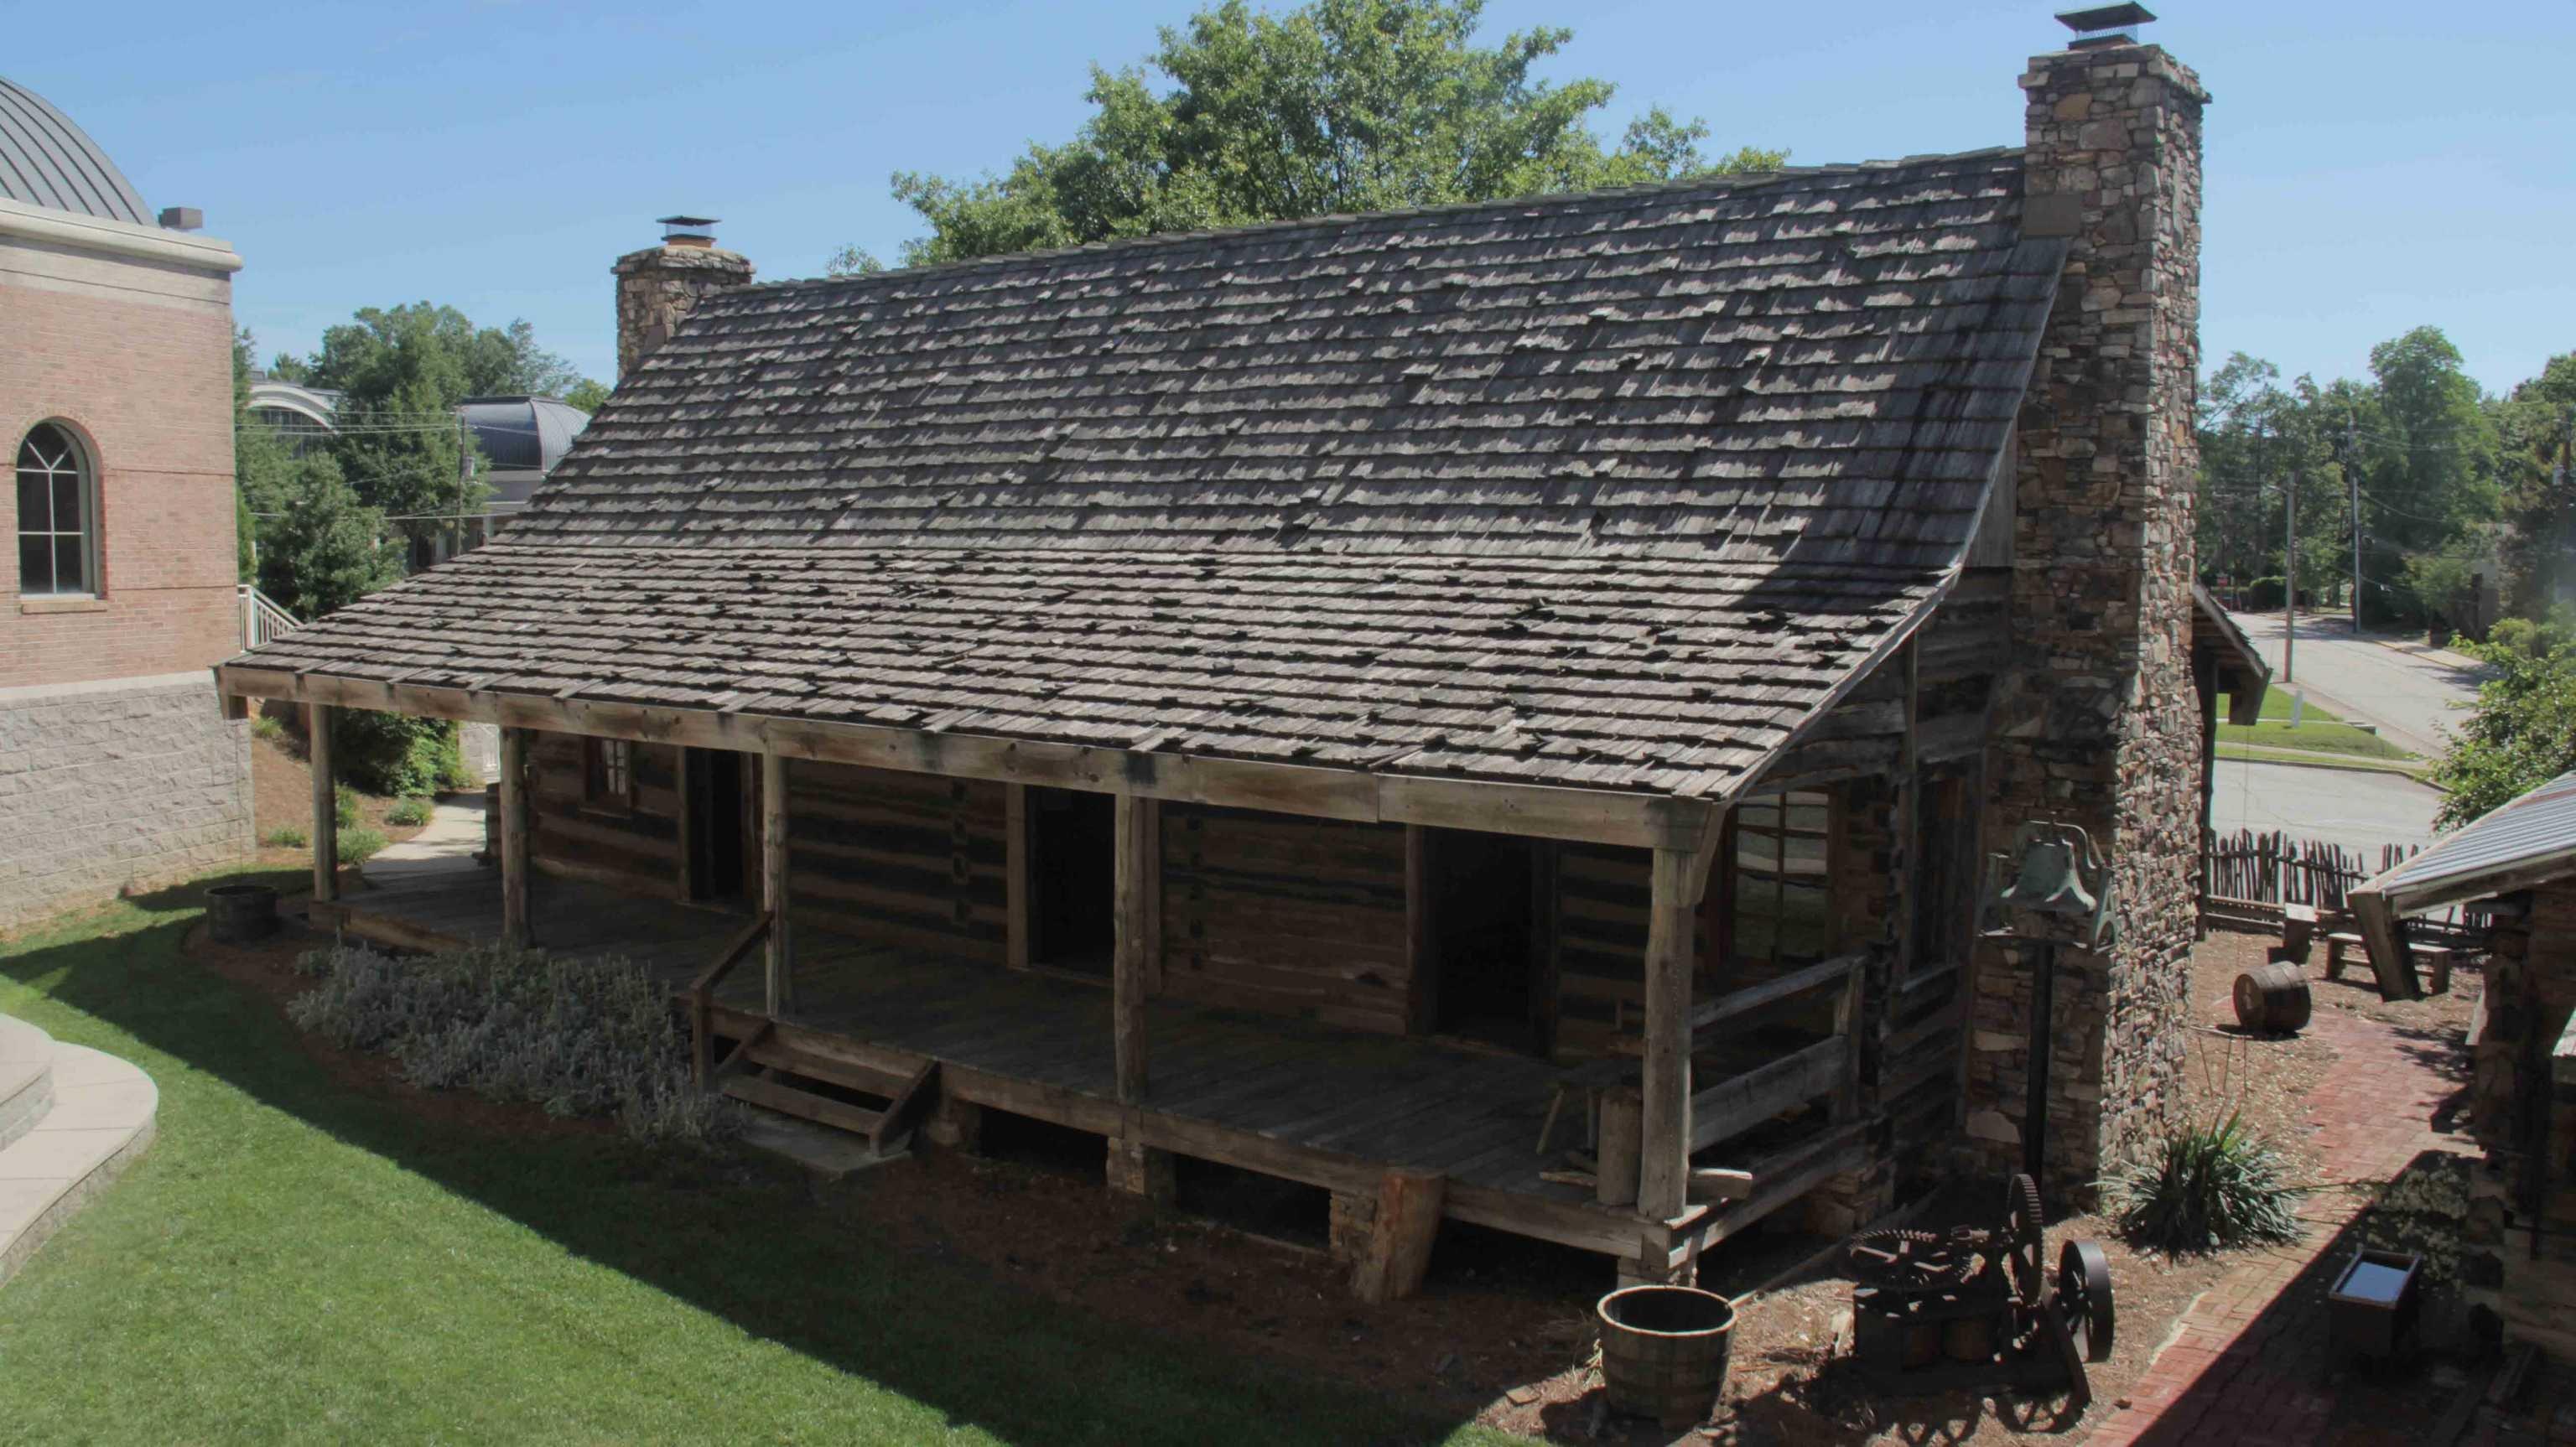 The Whitepath Cabin